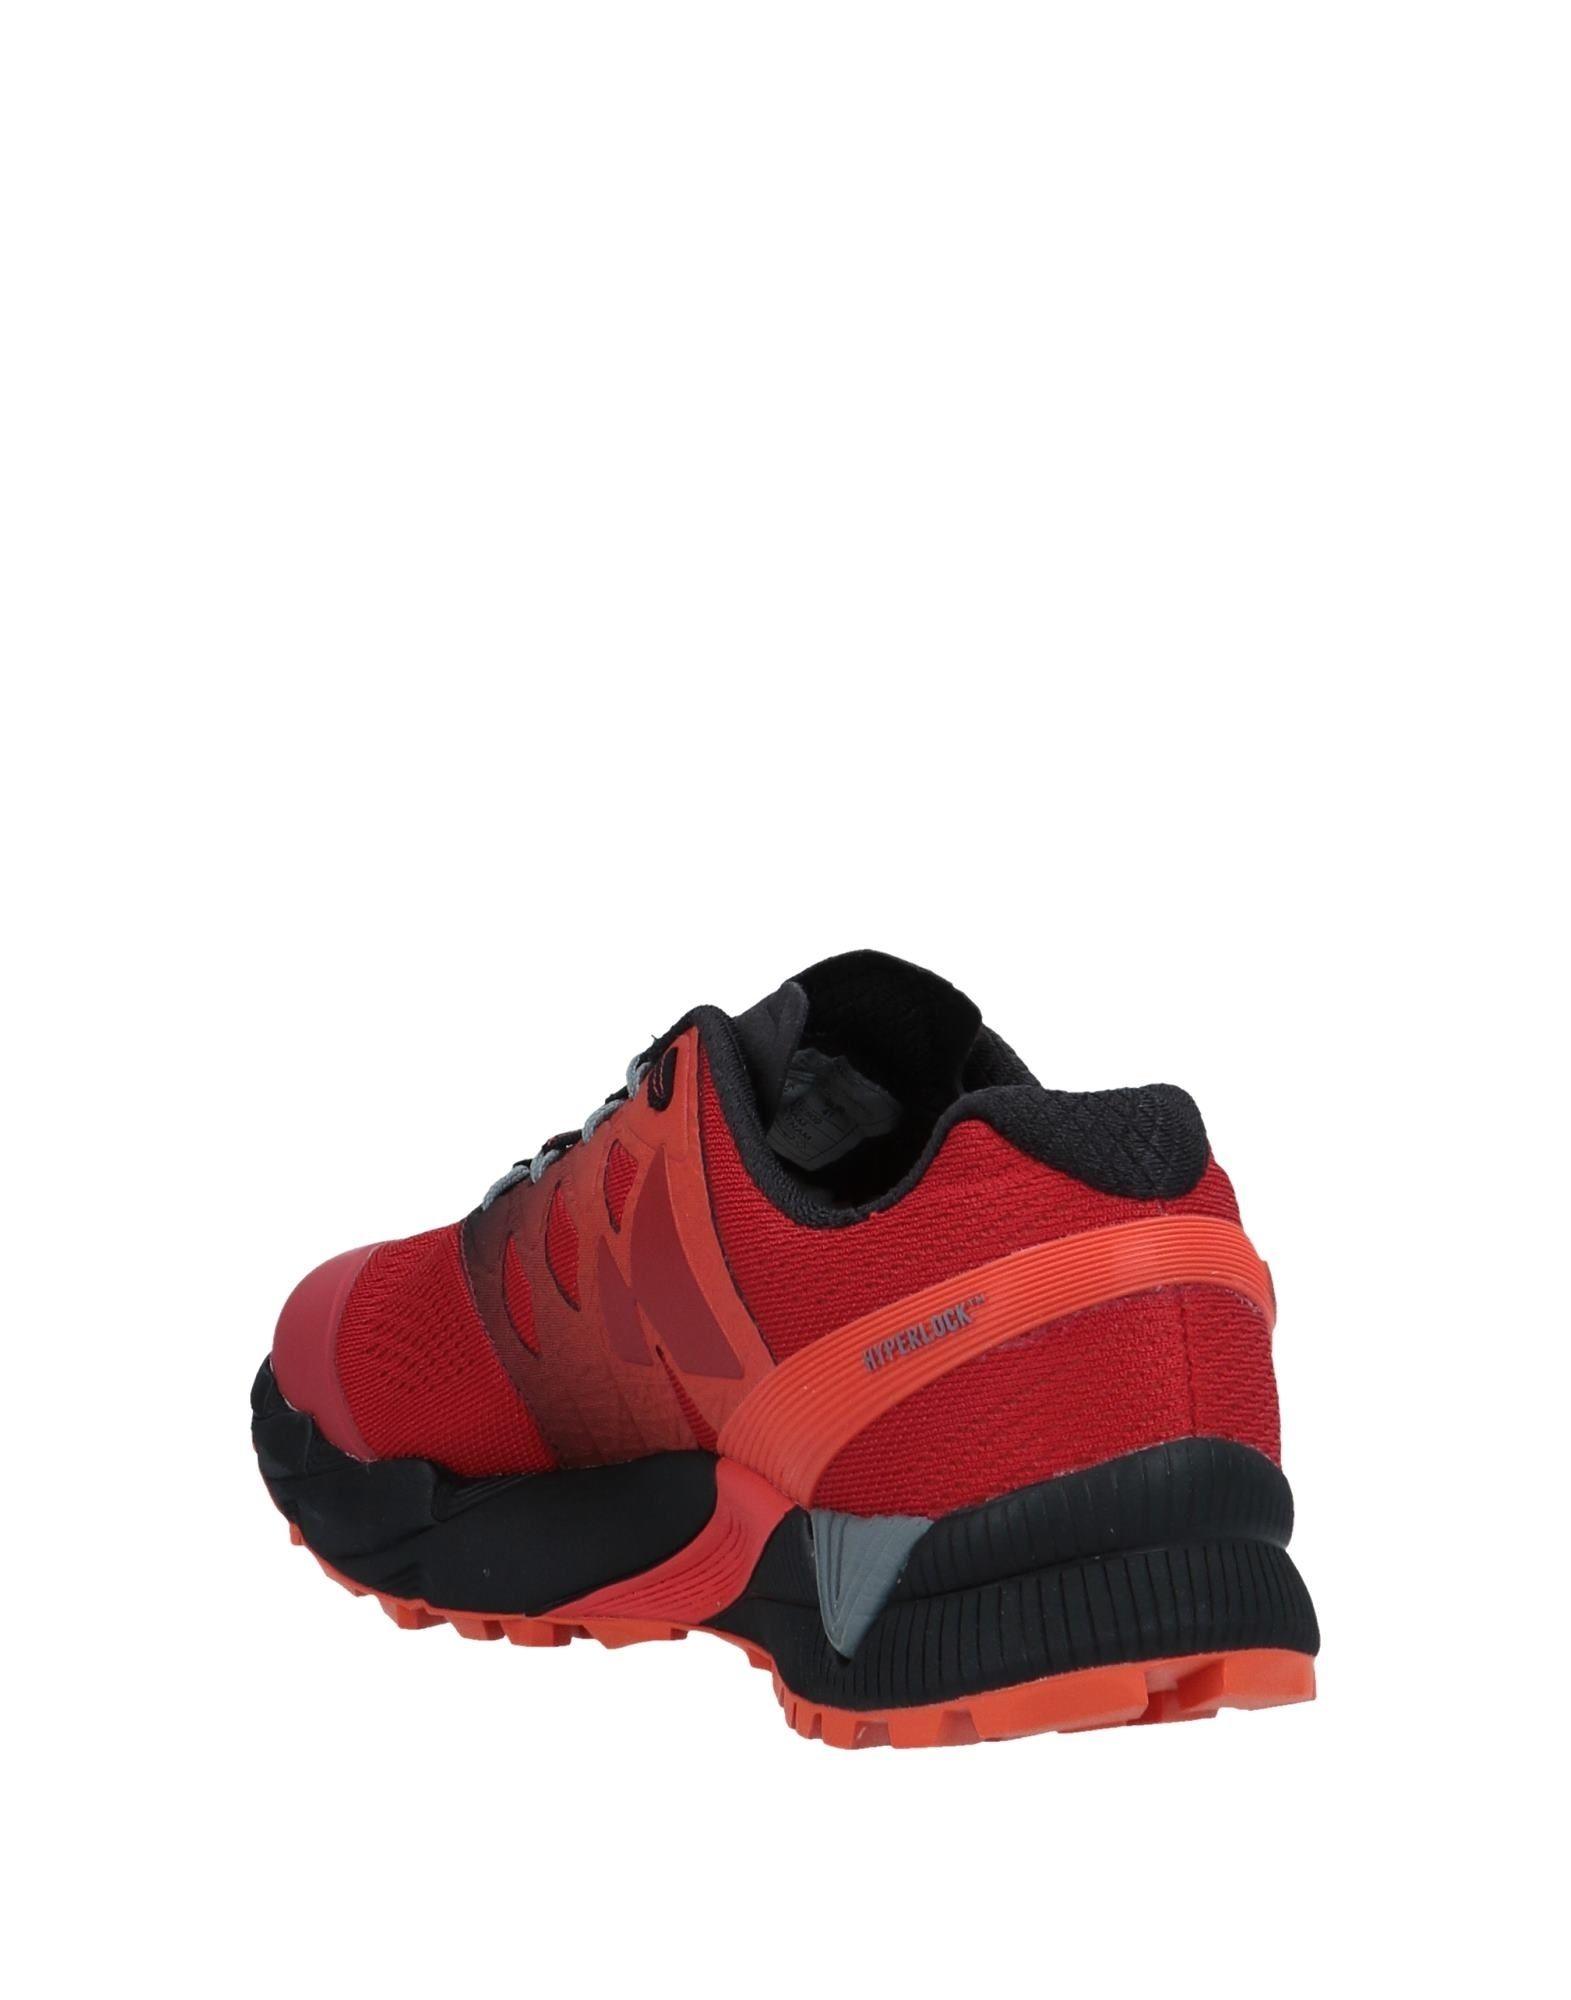 Merrell Sneakers  - Men Merrell Sneakers online on  Sneakers Australia - 11581817SV 7d77fc